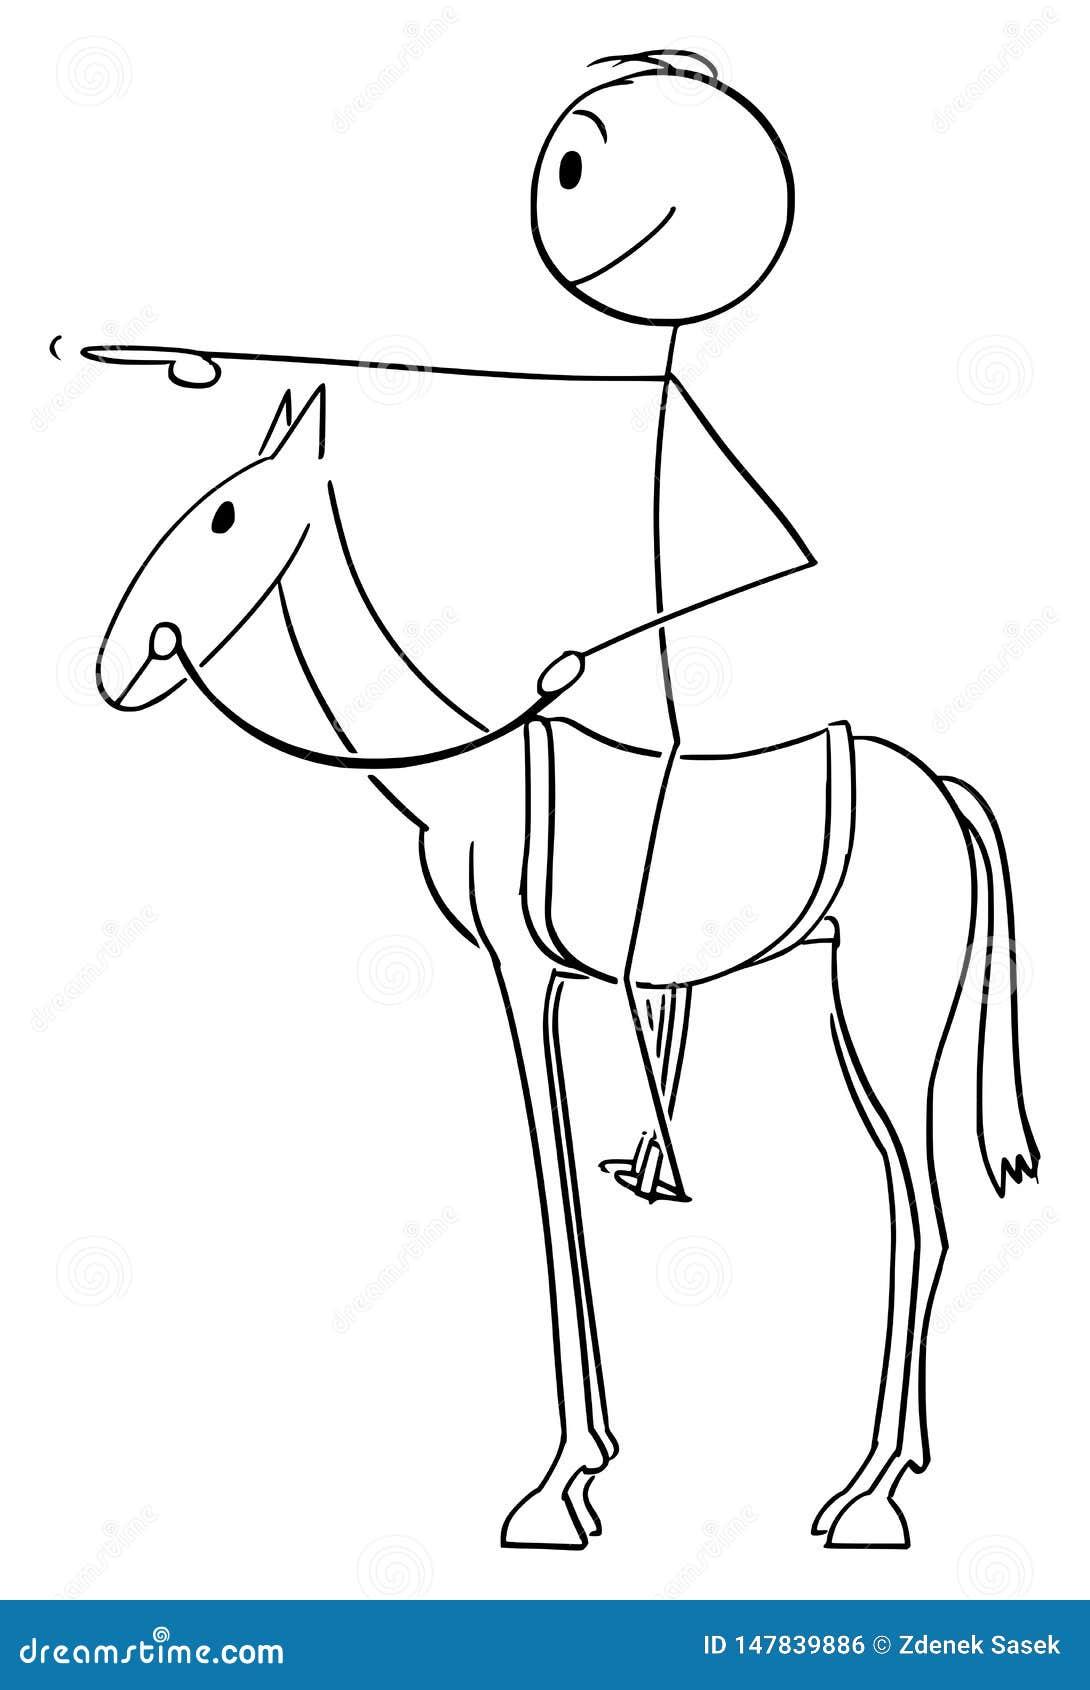 Man Sitting Horse Stock Illustrations 184 Man Sitting Horse Stock Illustrations Vectors Clipart Dreamstime